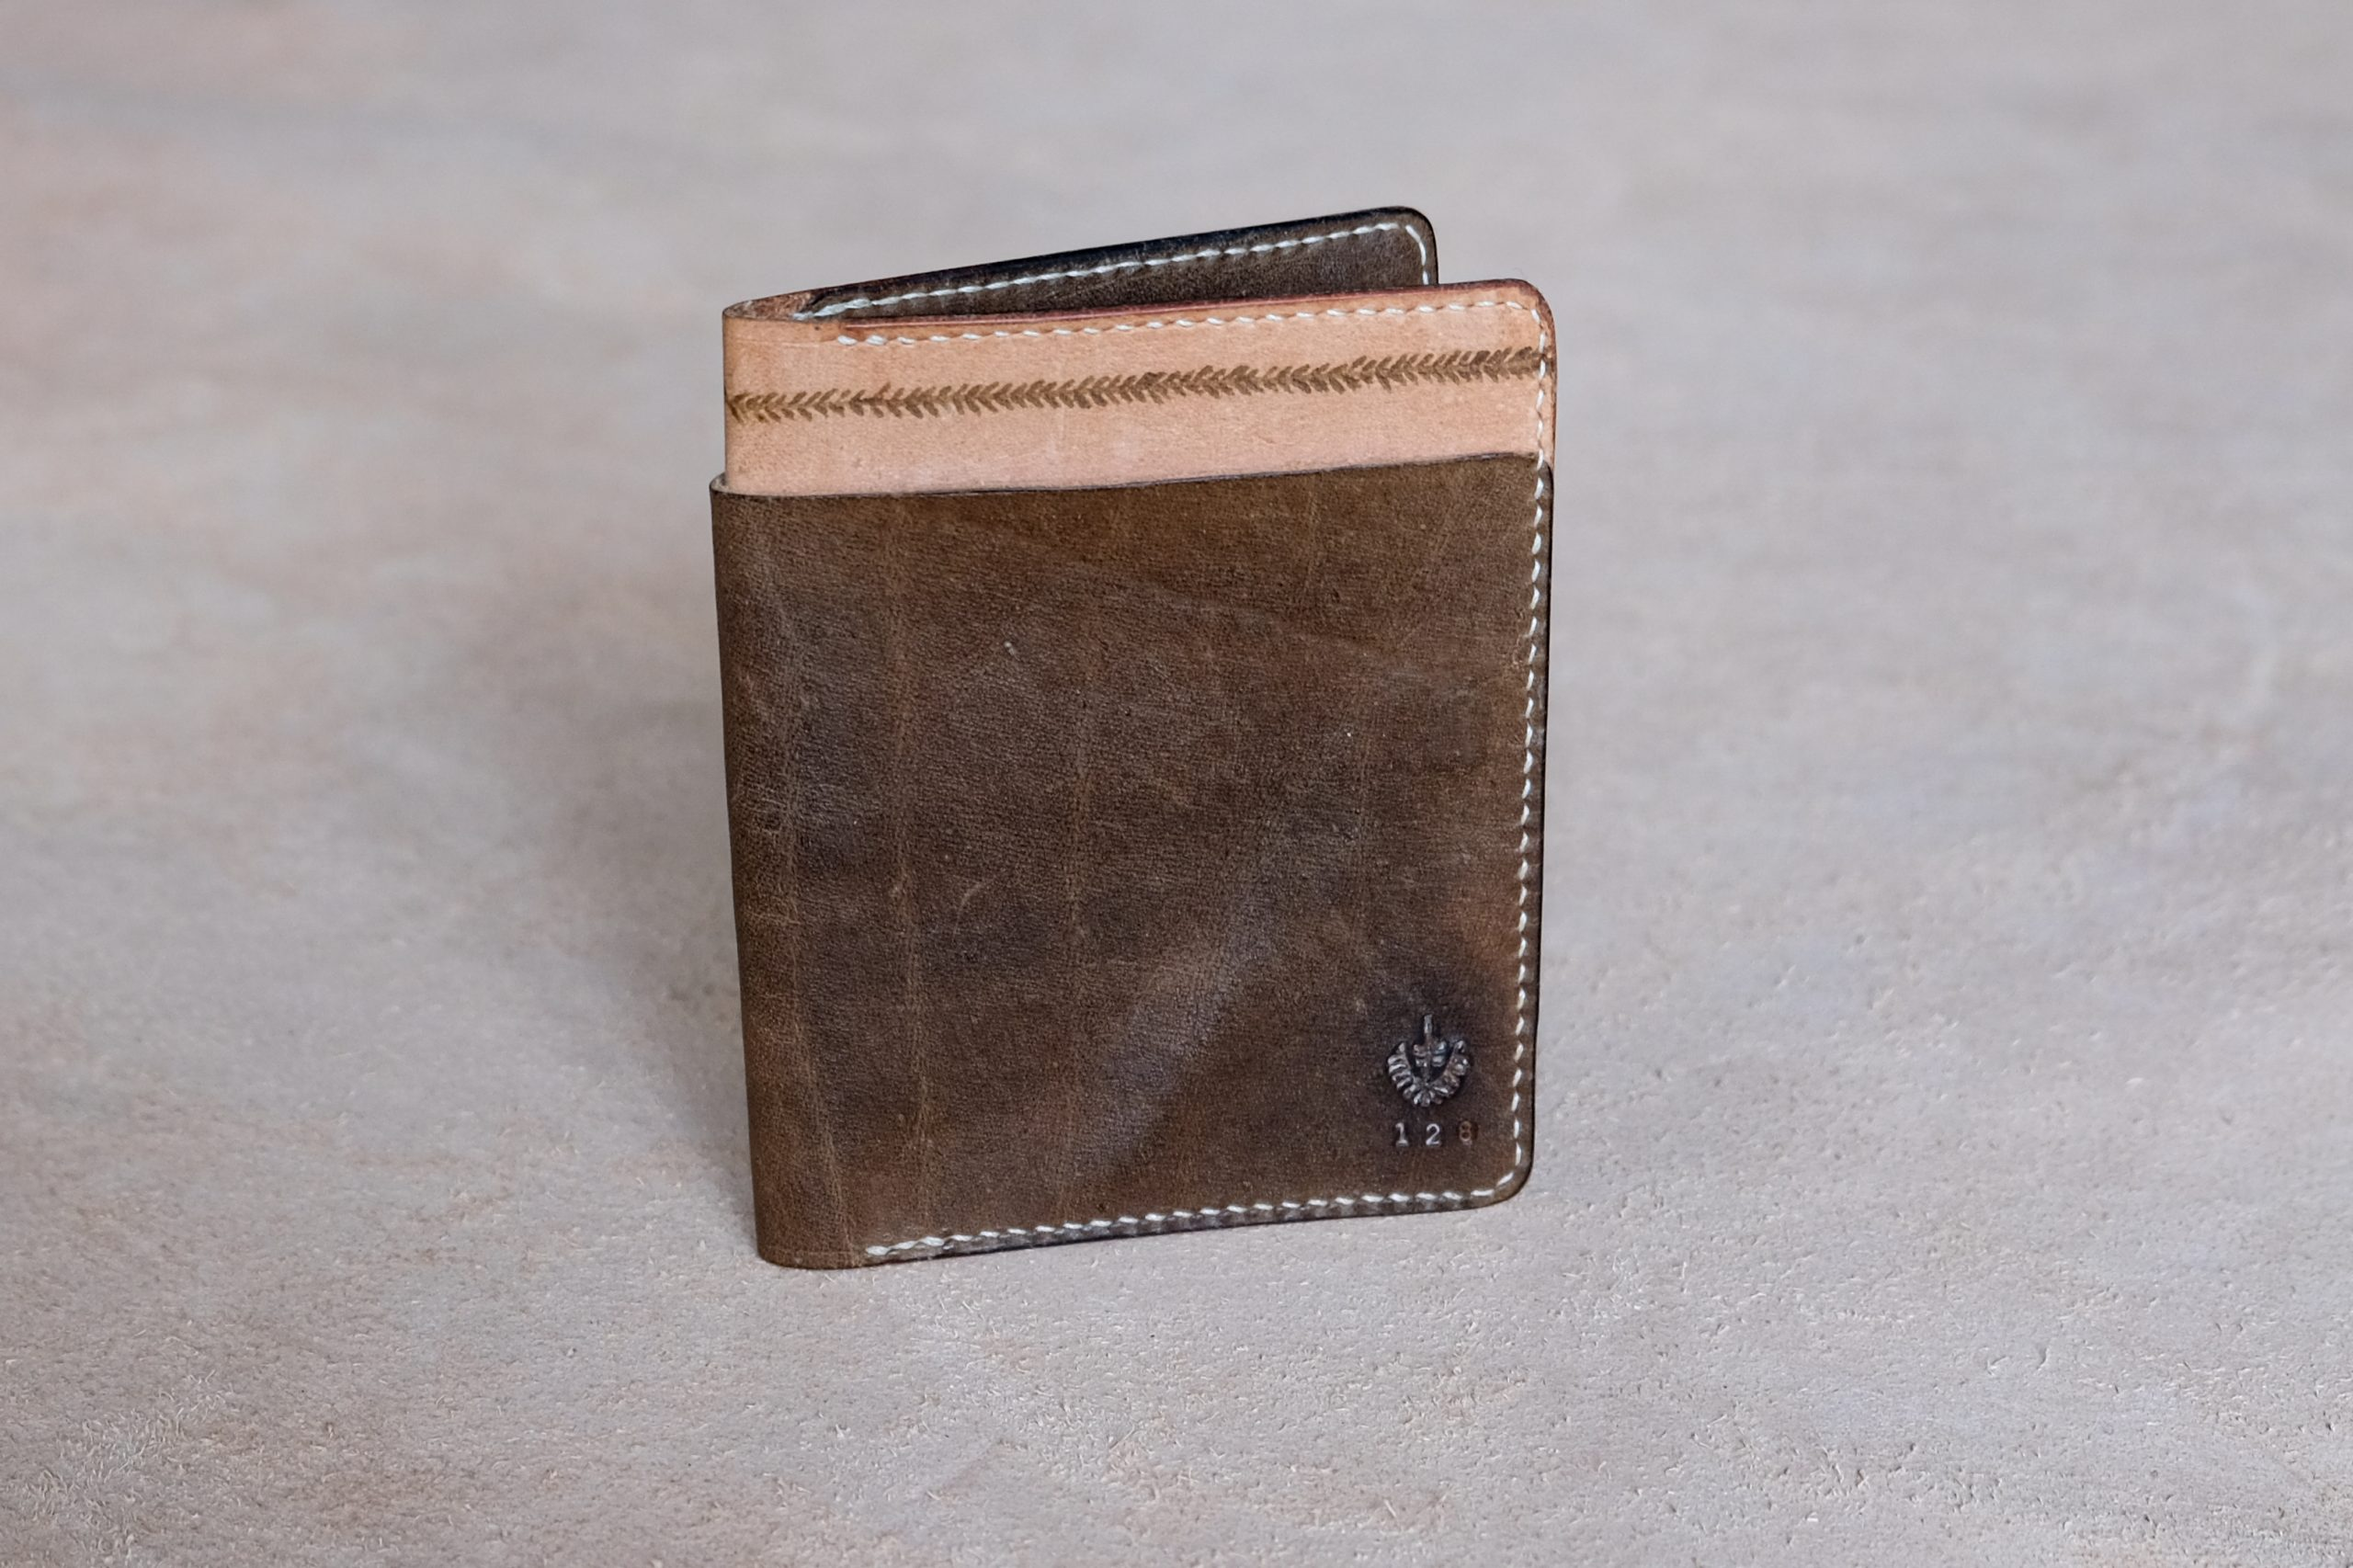 lerif designs large format leather bifold wallet in vinegaroon on beige background